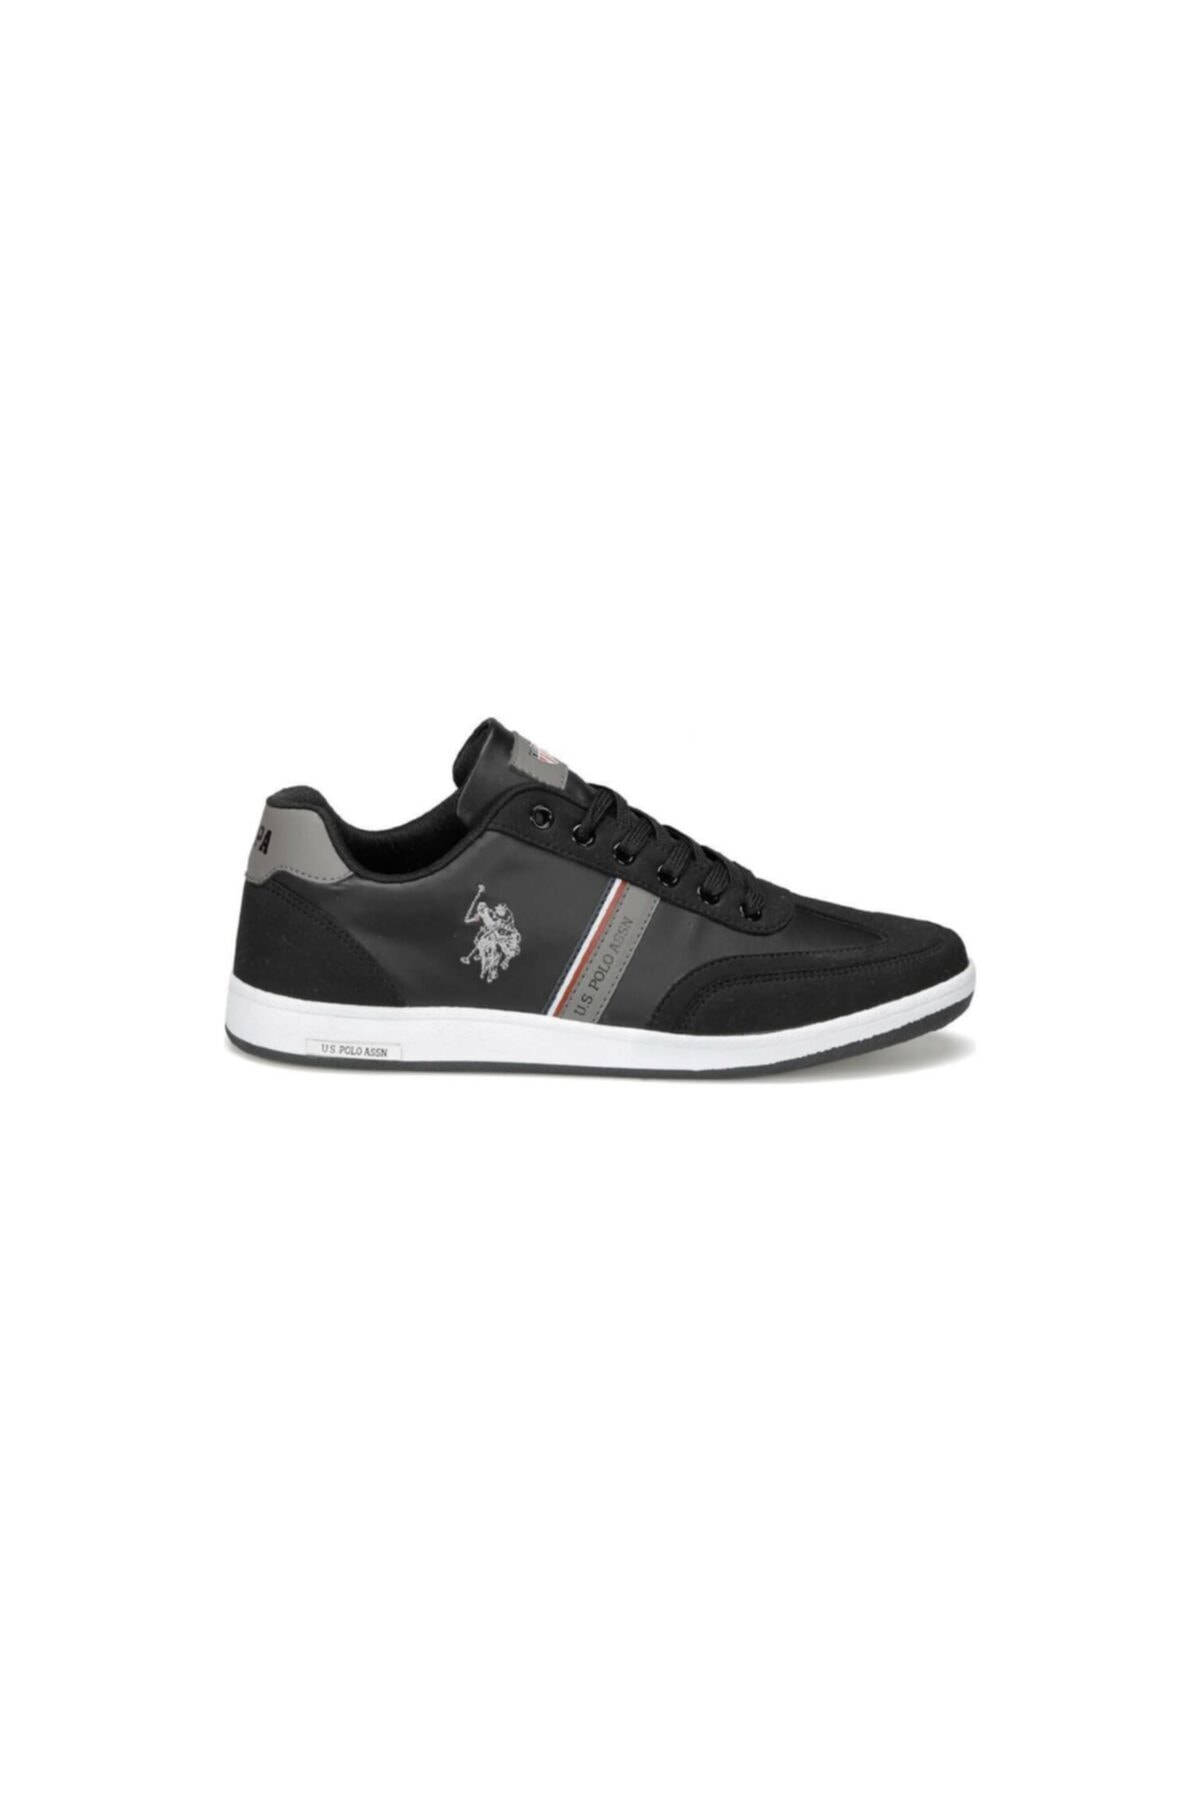 U.S. Polo Assn. KARES WT 9PR Siyah Erkek Sneaker Ayakkabı 100417978 2